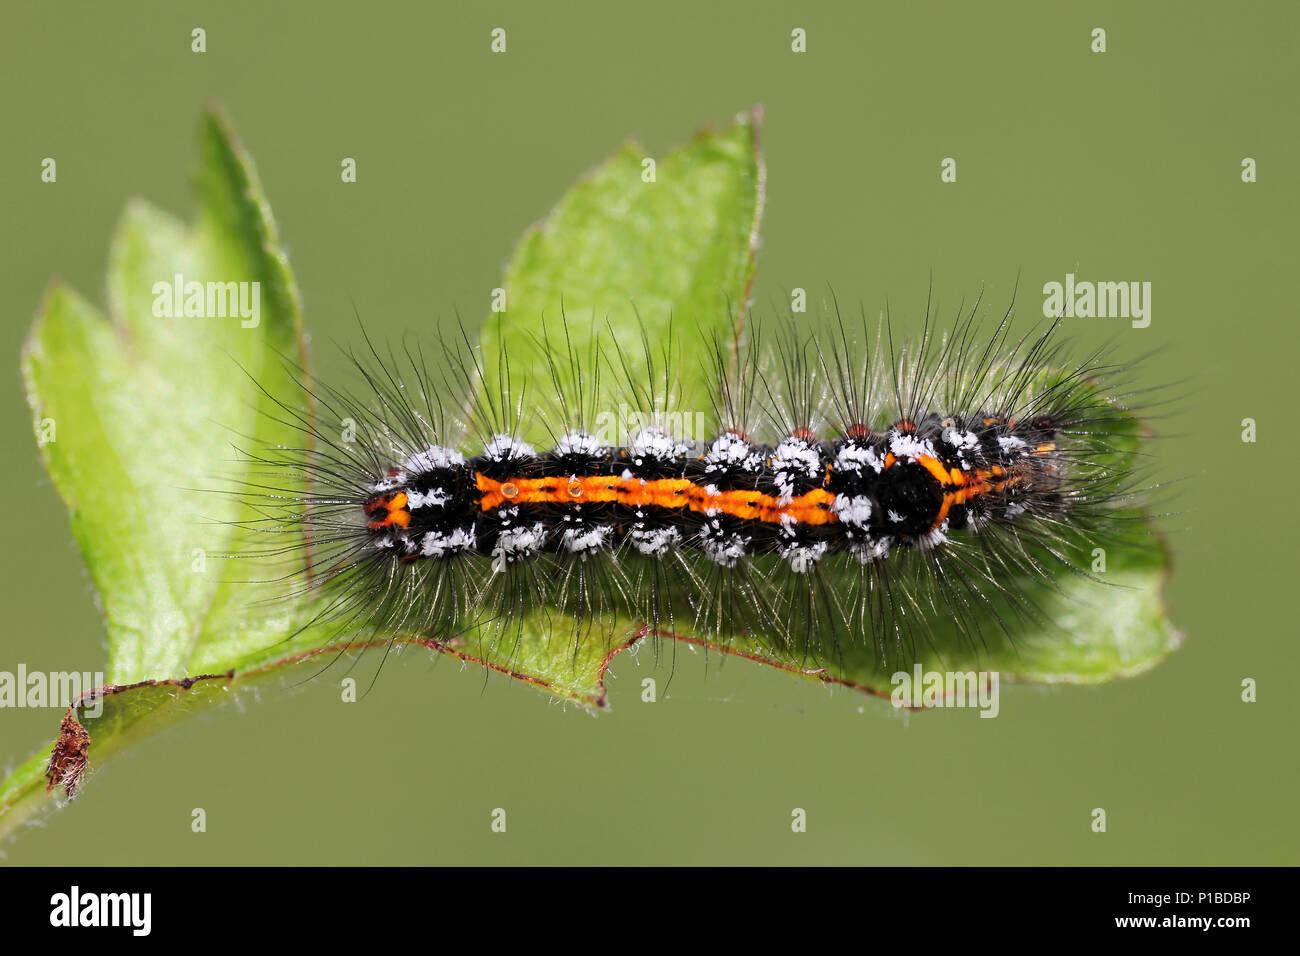 Gelb - Schwanz Euproctis imilis Caterpillar Stockbild